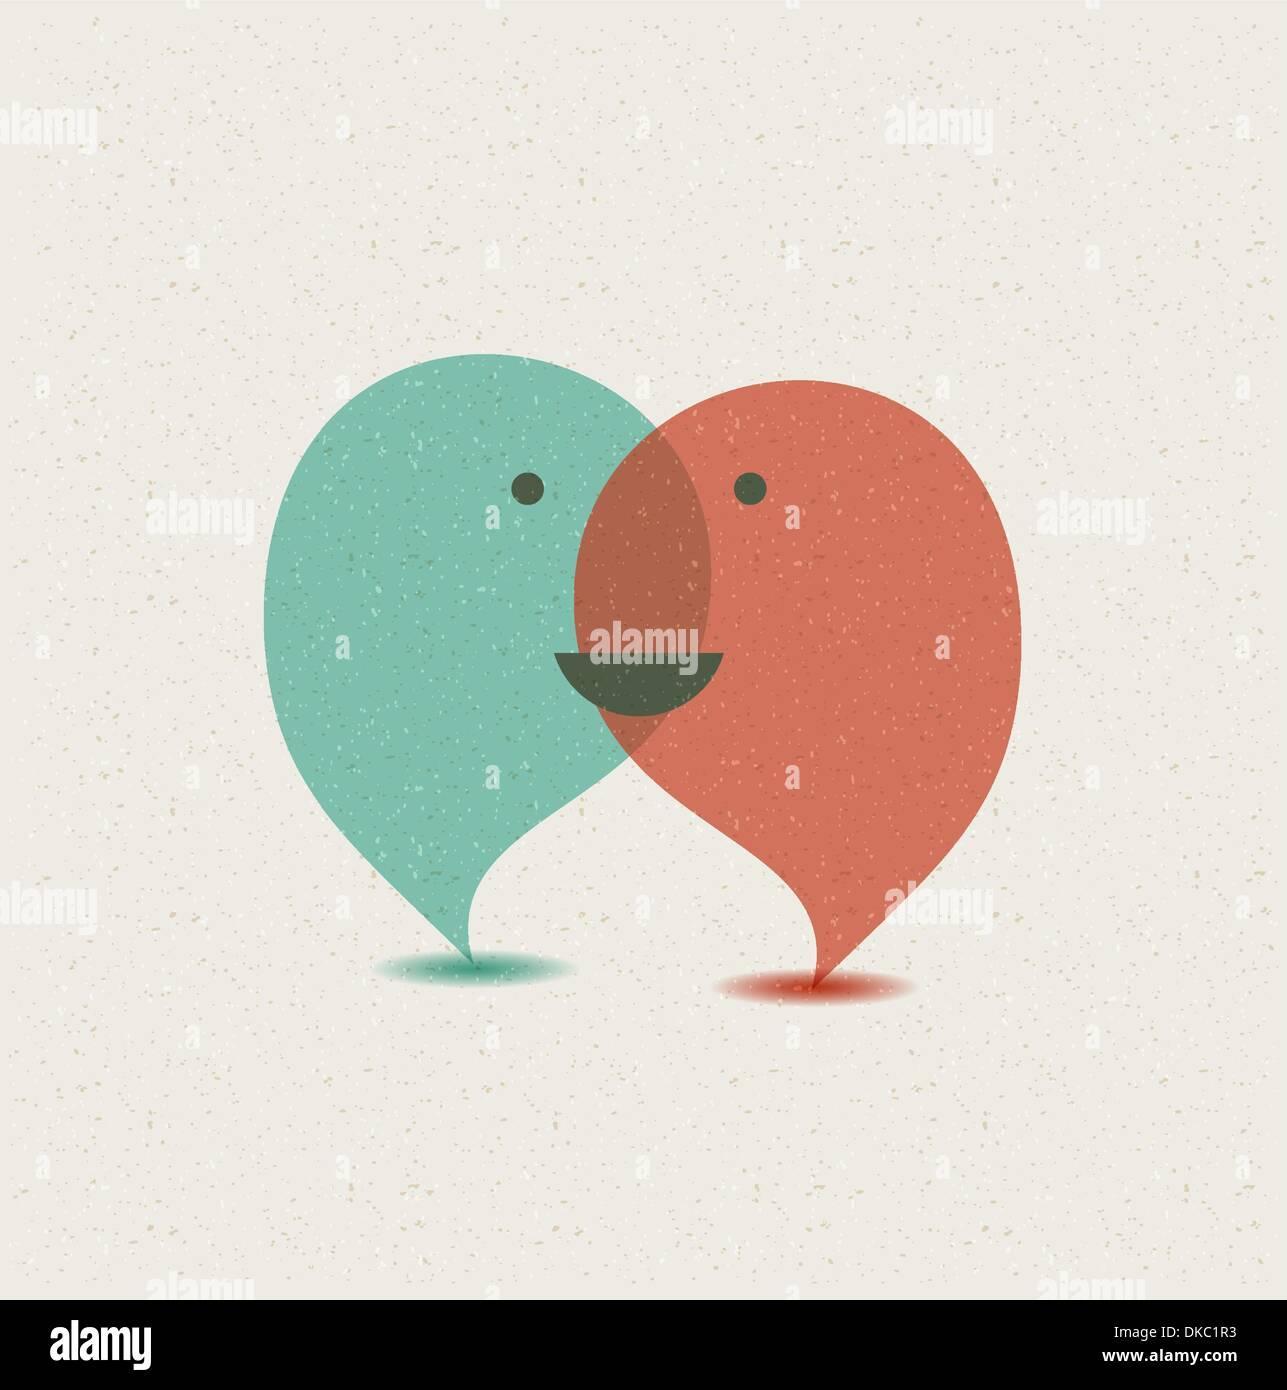 Dialog speech bubbles. - Stock Image